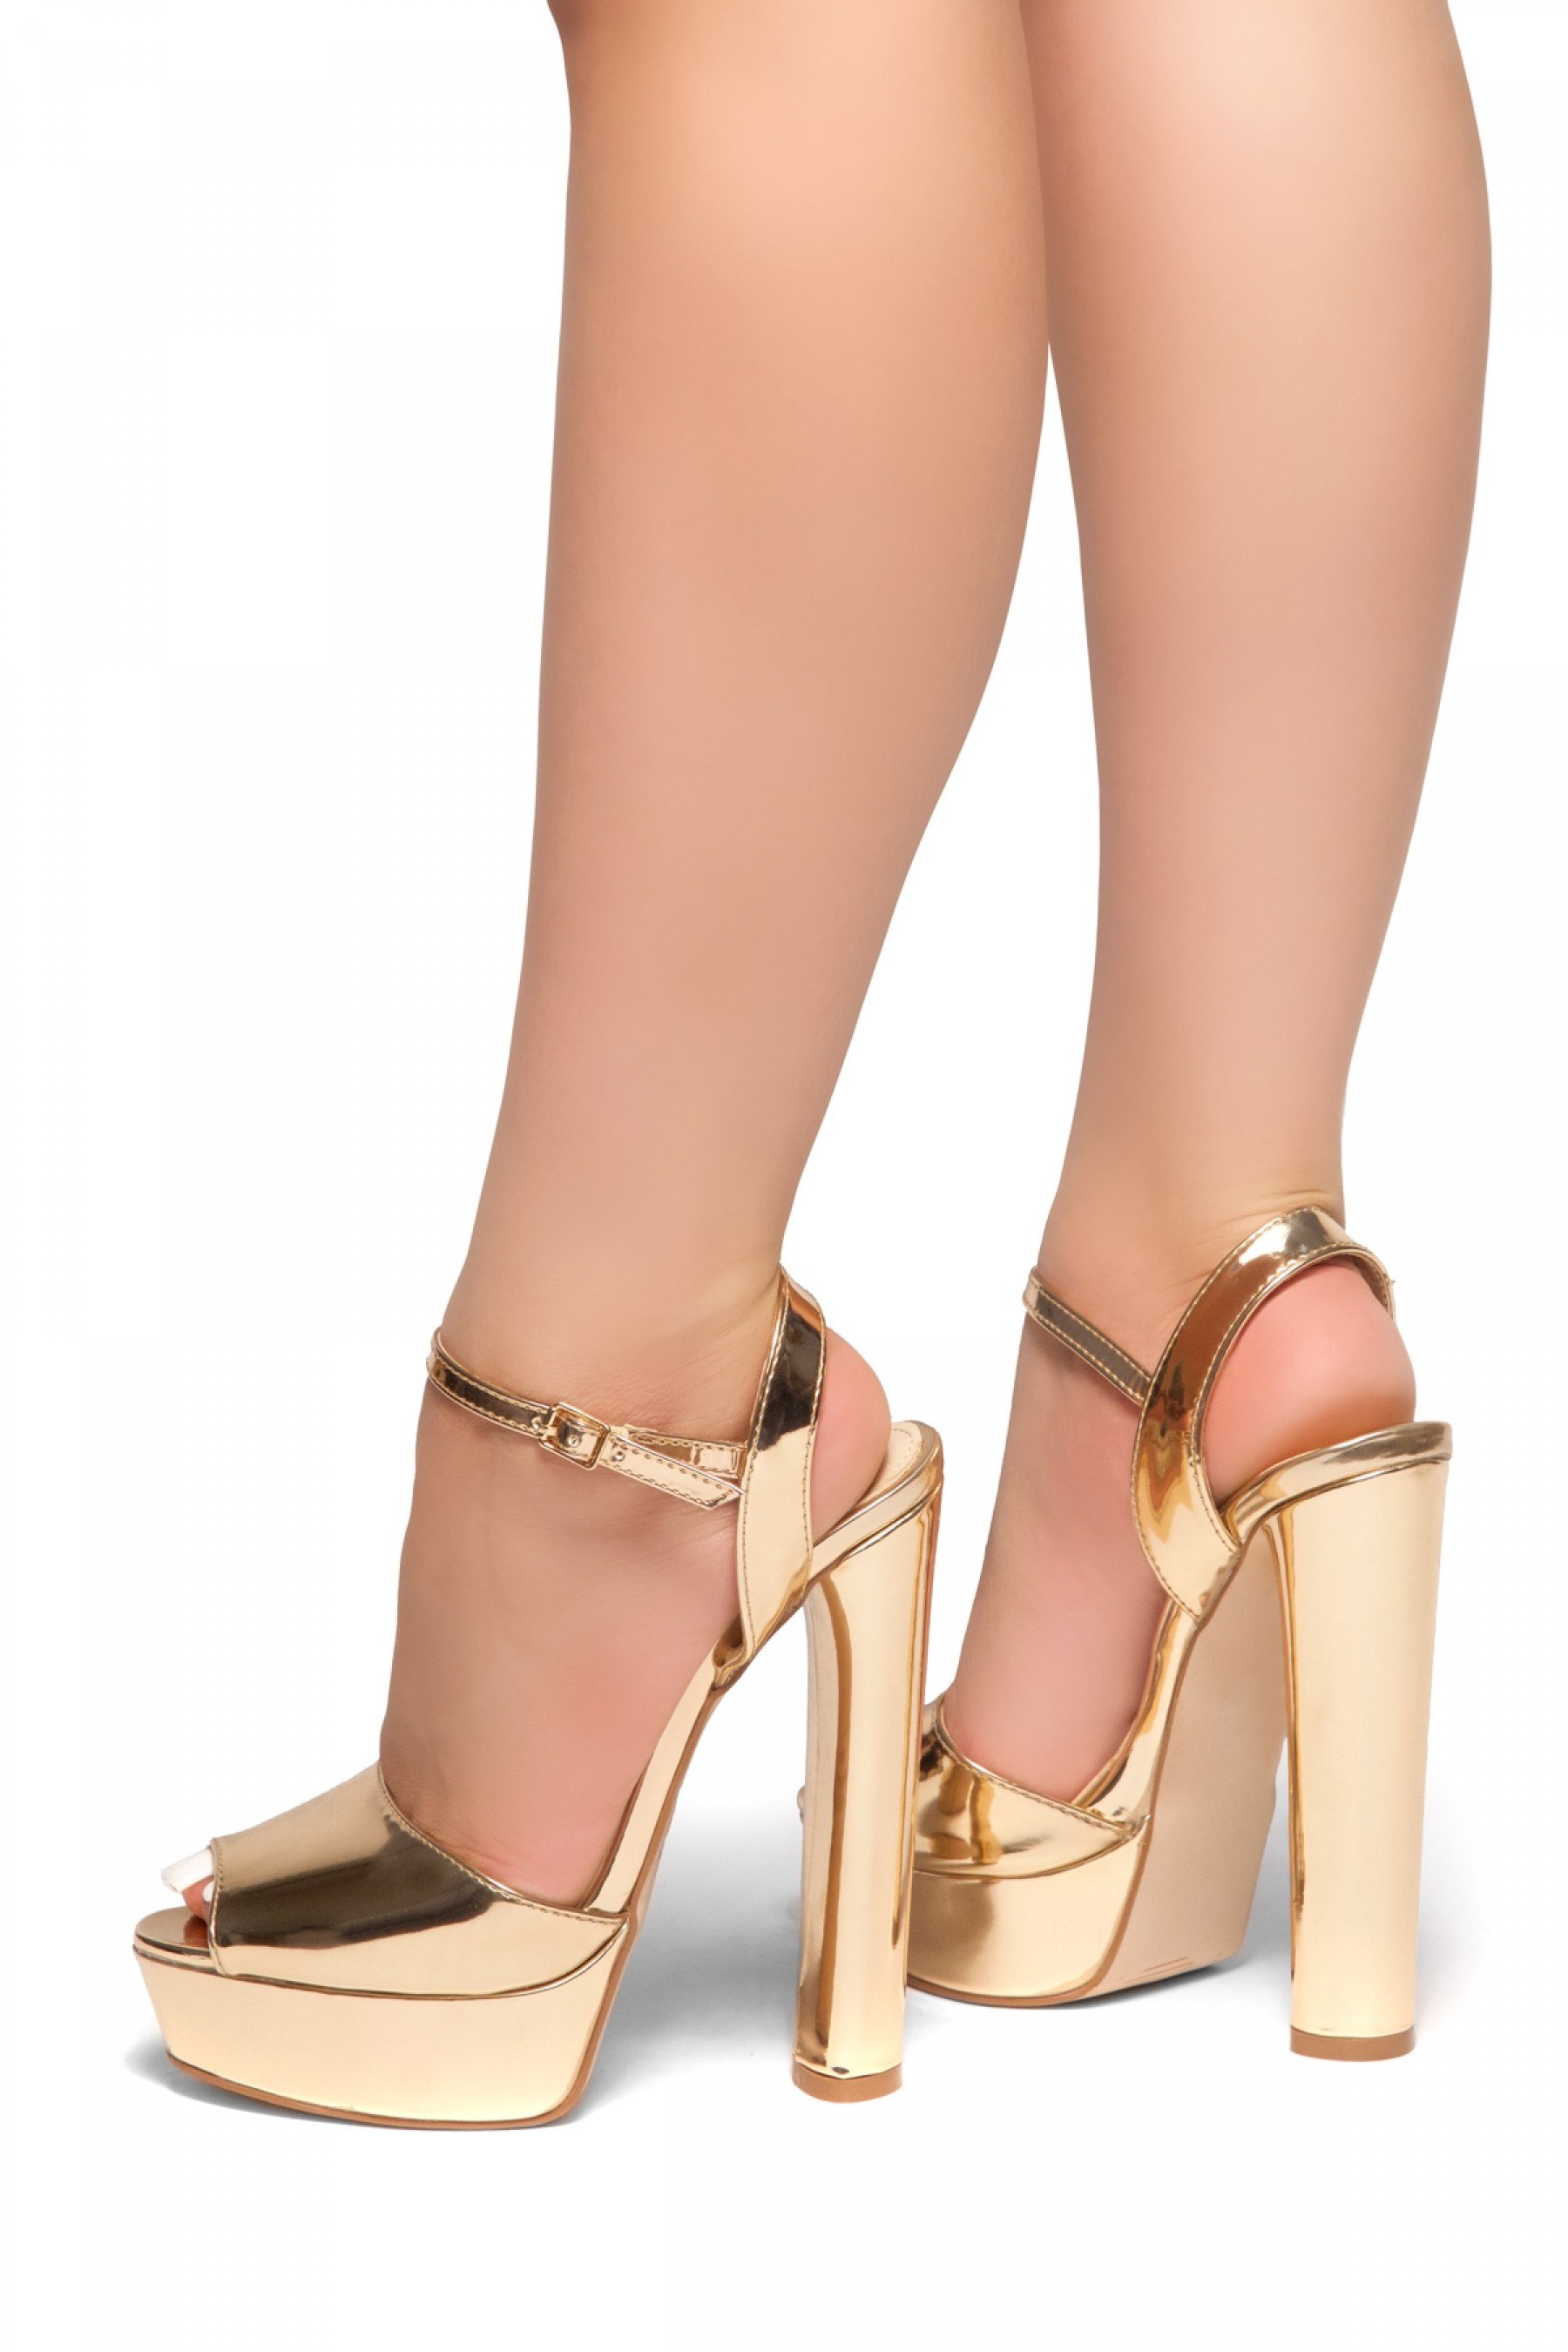 c311da90ec7 HerStyle CHASITY-Peep Toe Platform Heel (Rose Gold)